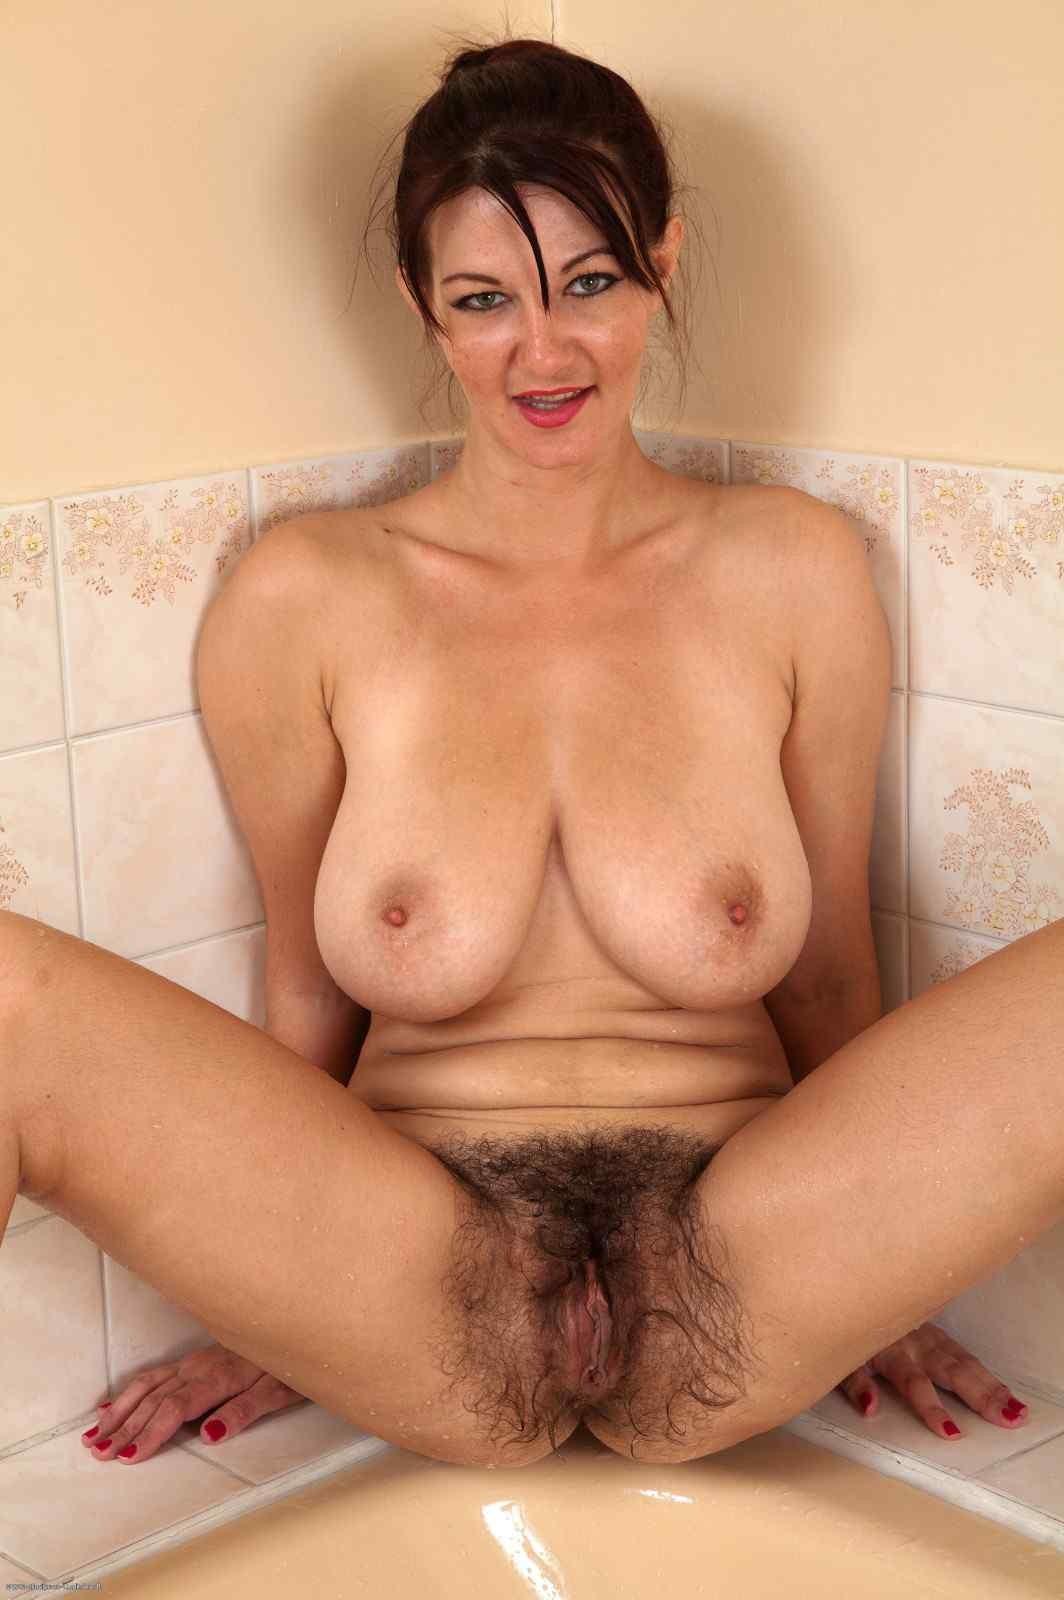 Very hairy mom